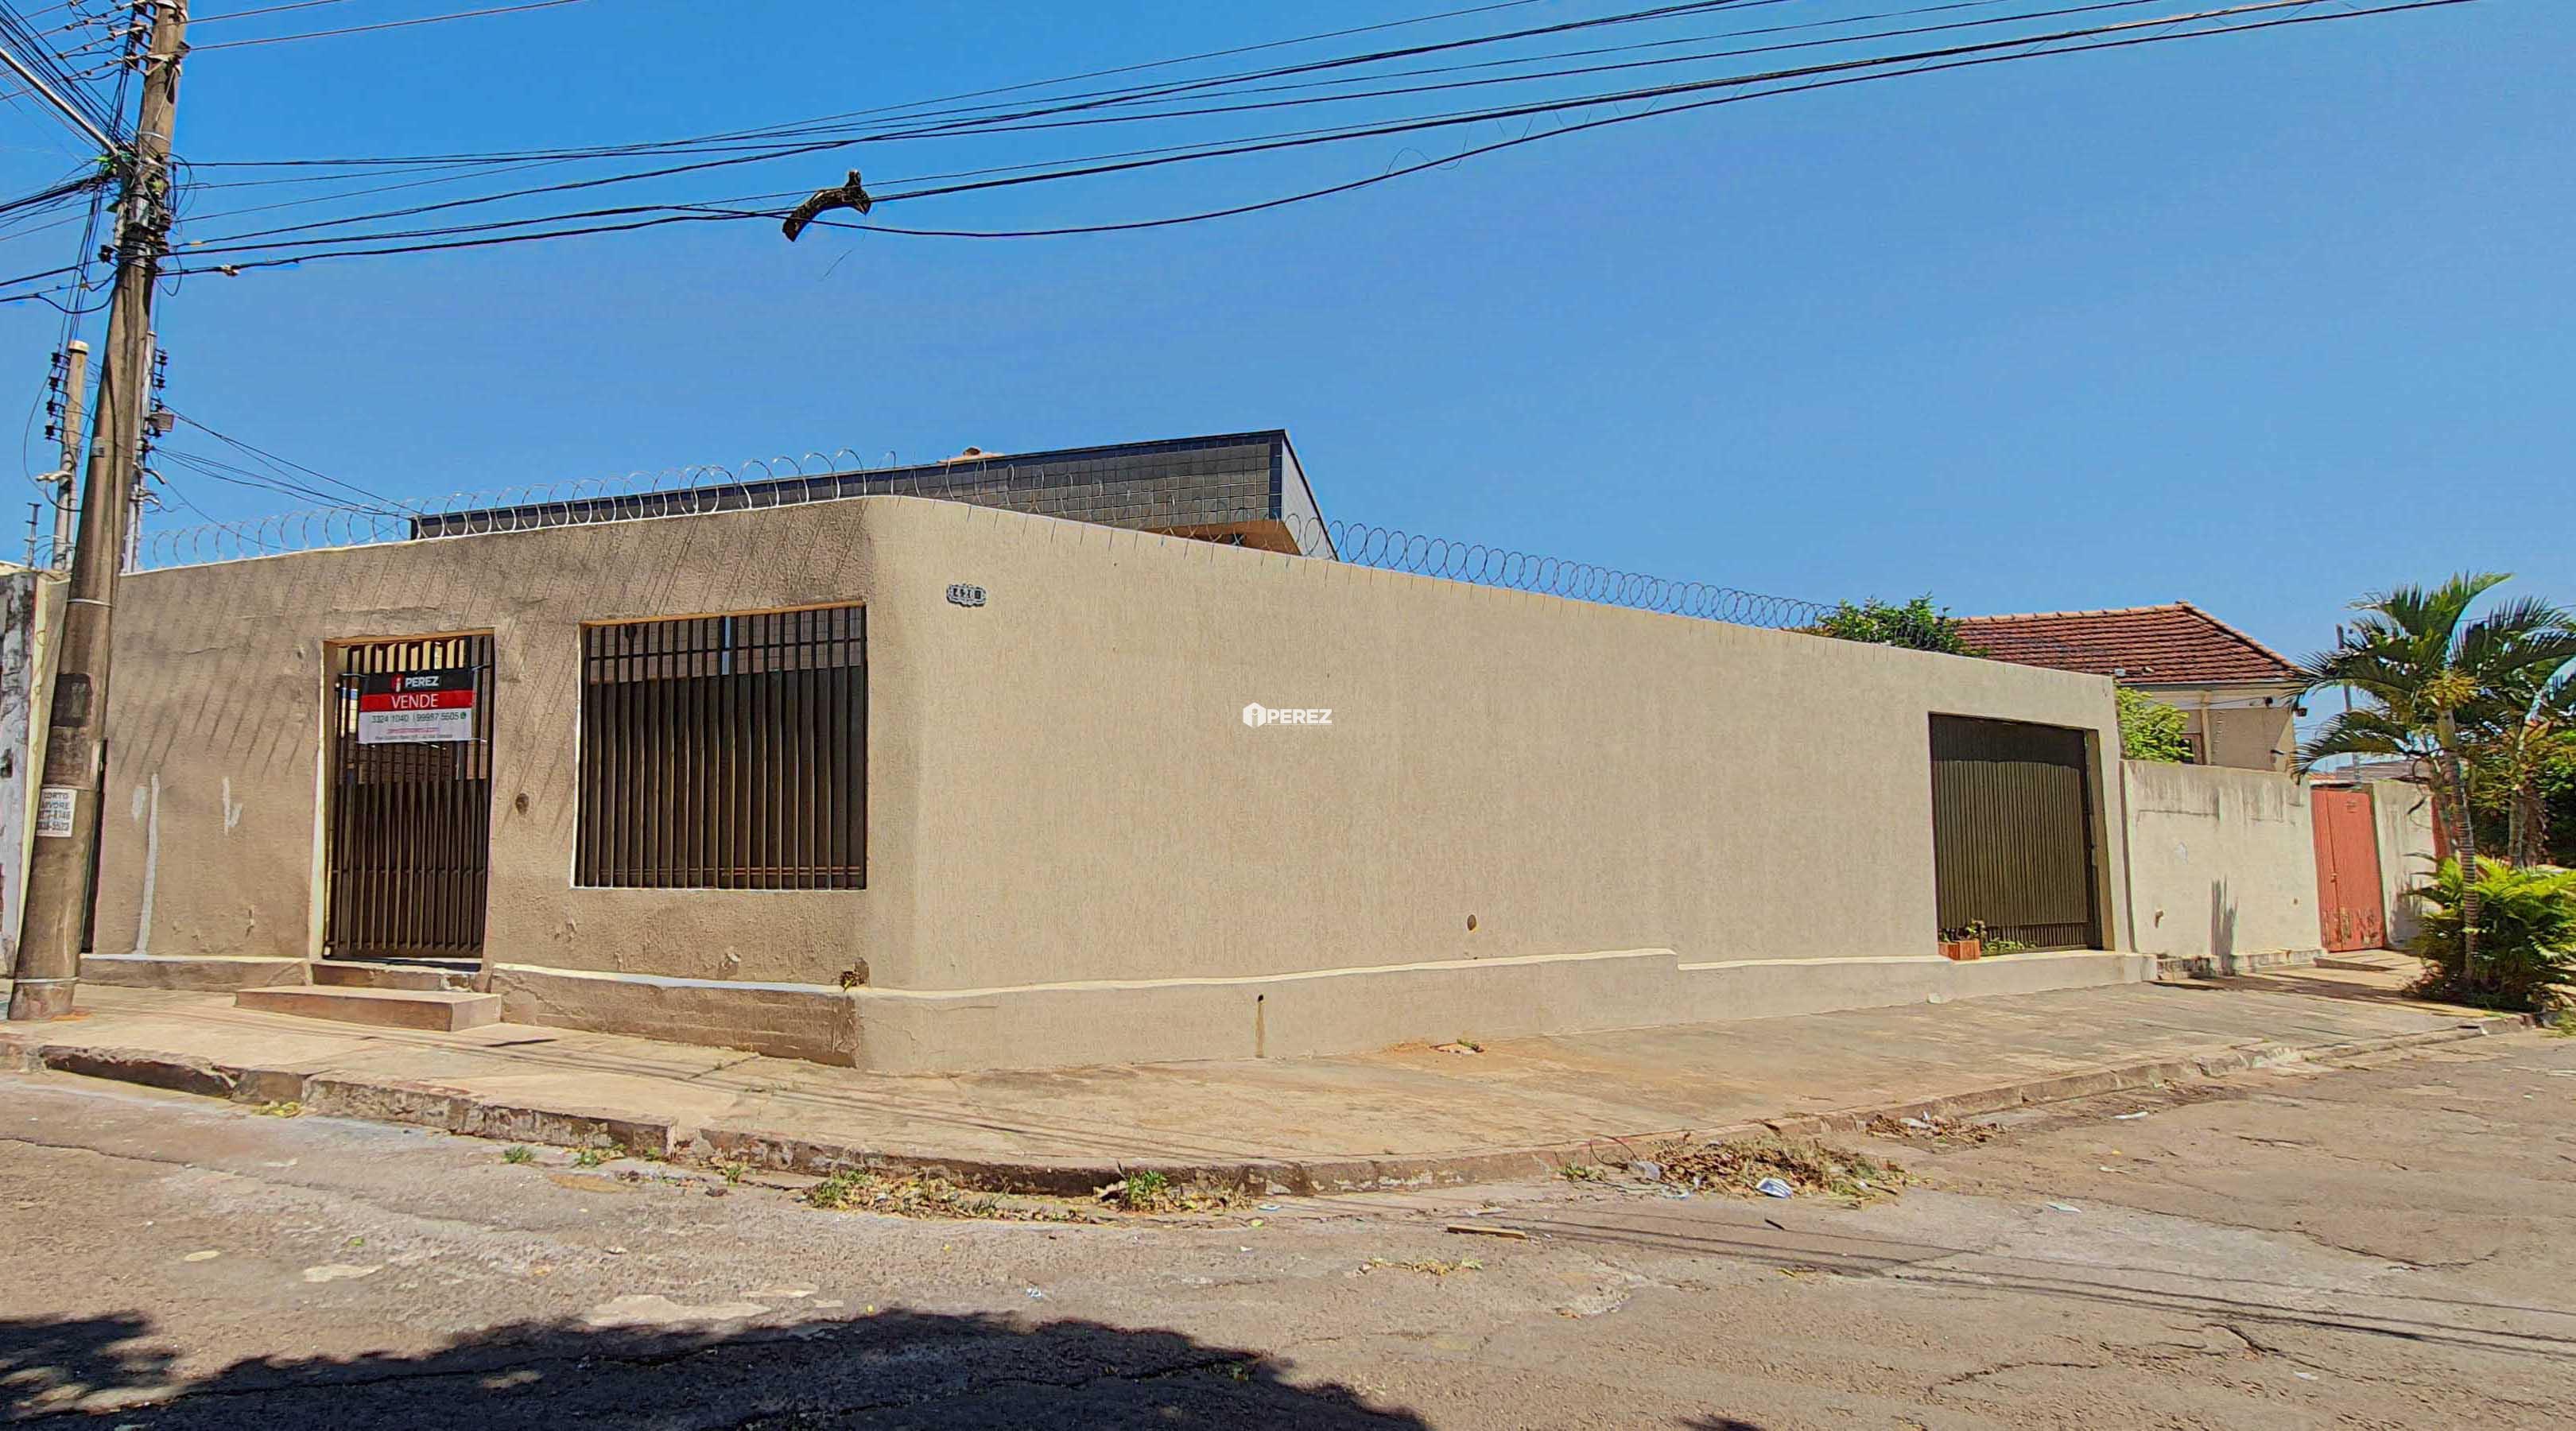 venda-campo-grande-ms-casa-comercial-engenheiro-roberto-mange-amambai-perez-imoveis